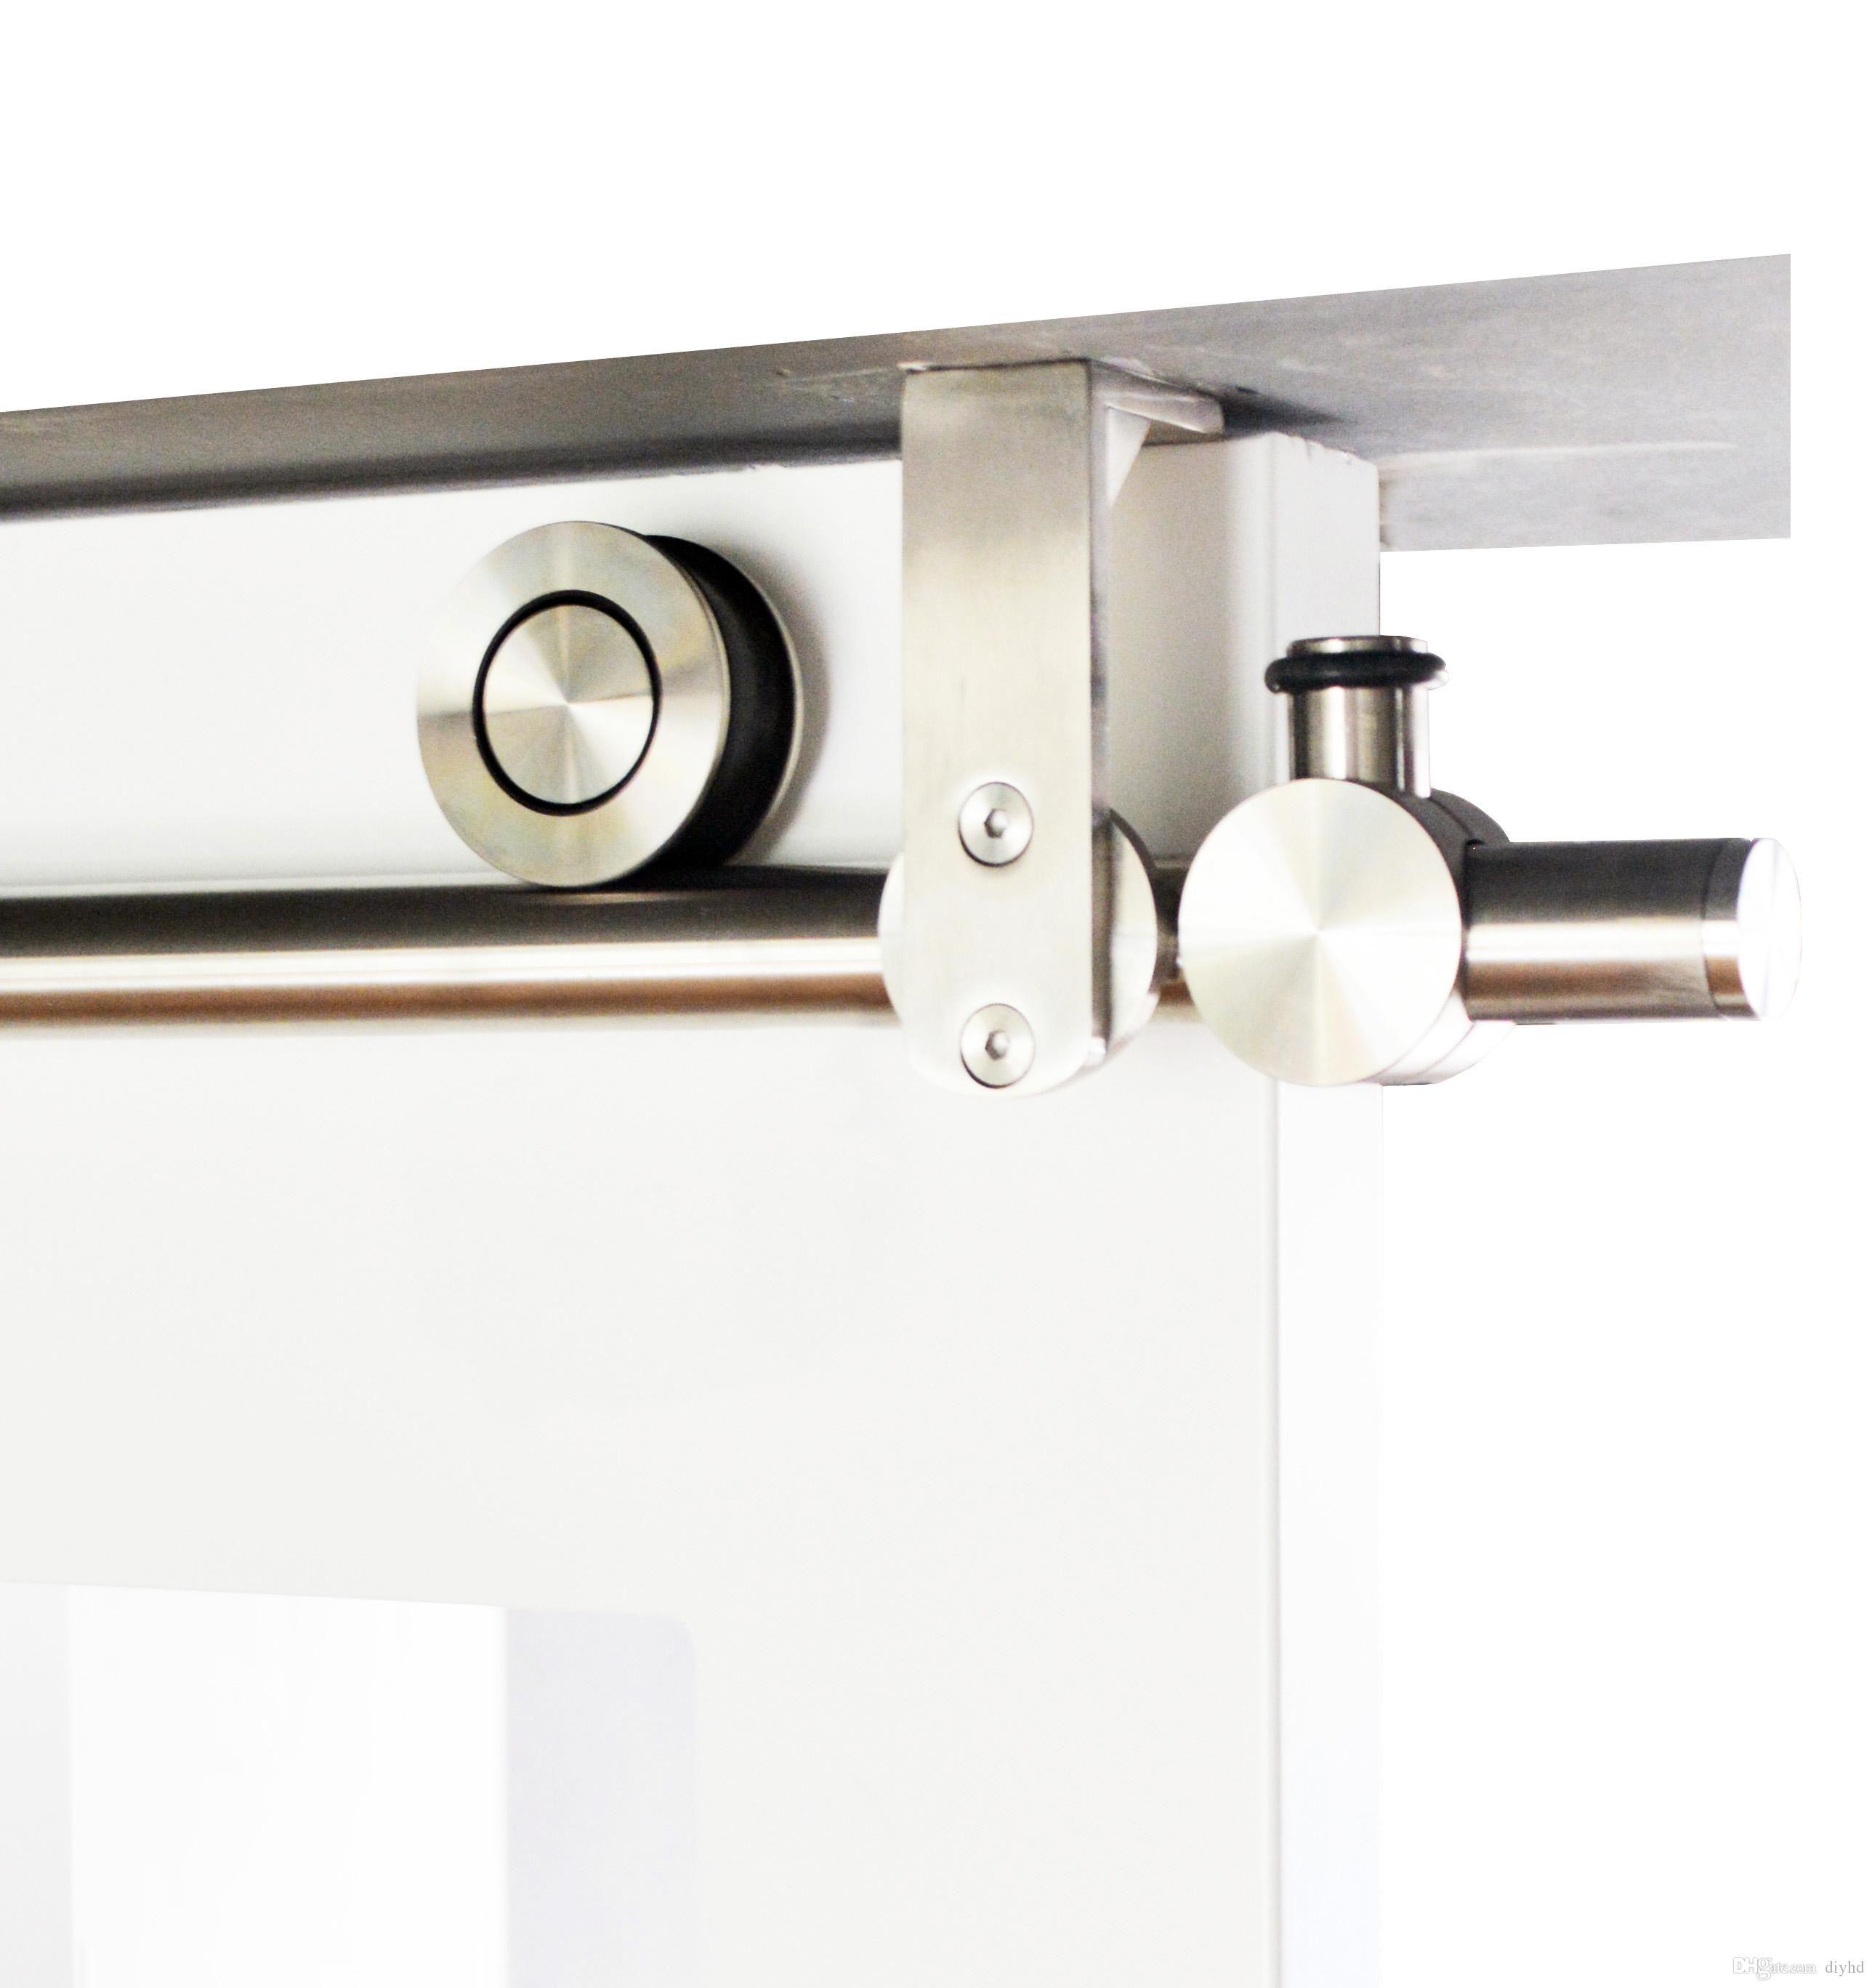 103 Reference Of Barn Door Corner Bracket In 2020 Bypass Barn Door Bypass Barn Door Hardware Sliding Door Track